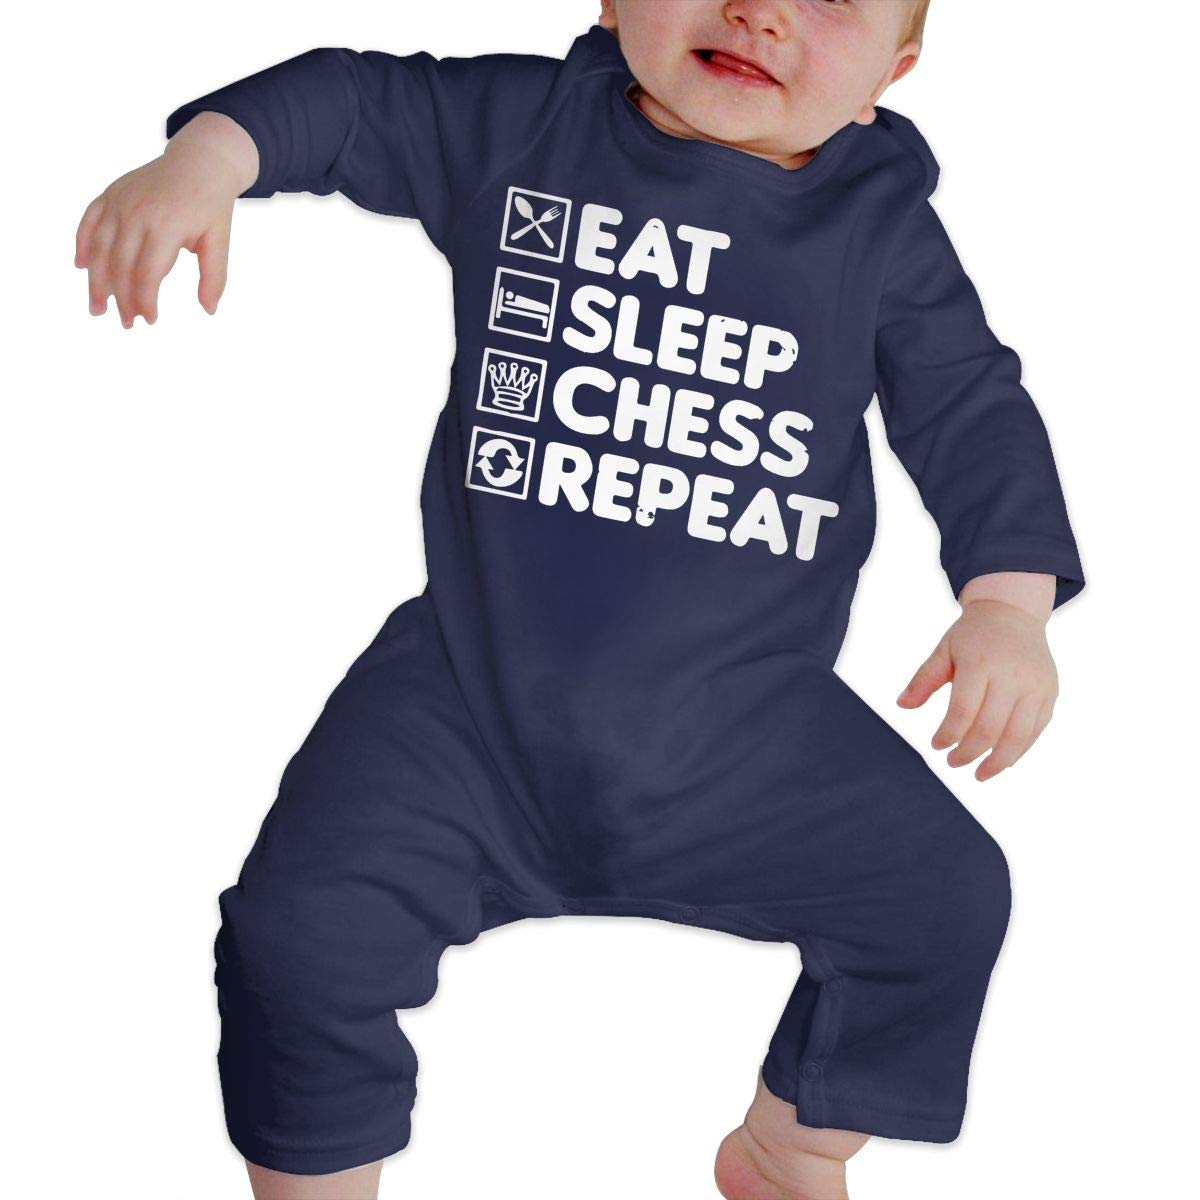 LBJQ8 Eat Sleep Repeat Chess Unisex Baby Long Sleeve Romper Jumpsuit Bodysuit